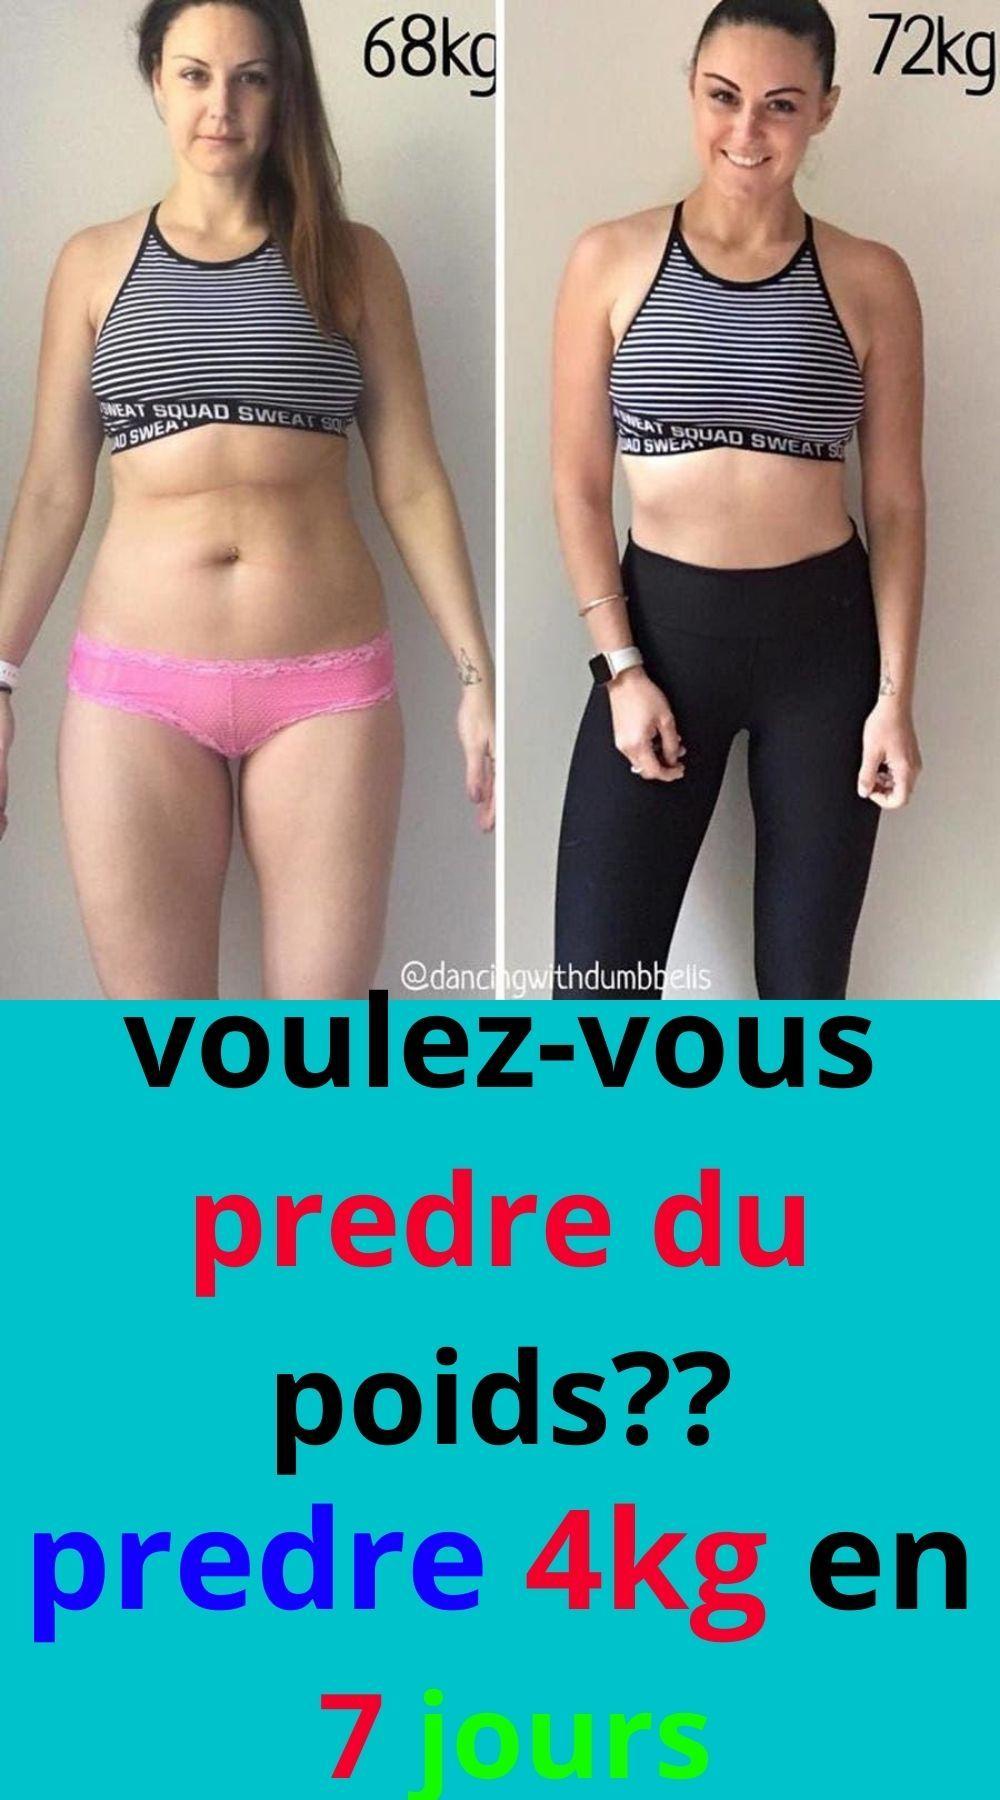 modafinil perte de graisse 50 ans, femme, perte de graisse